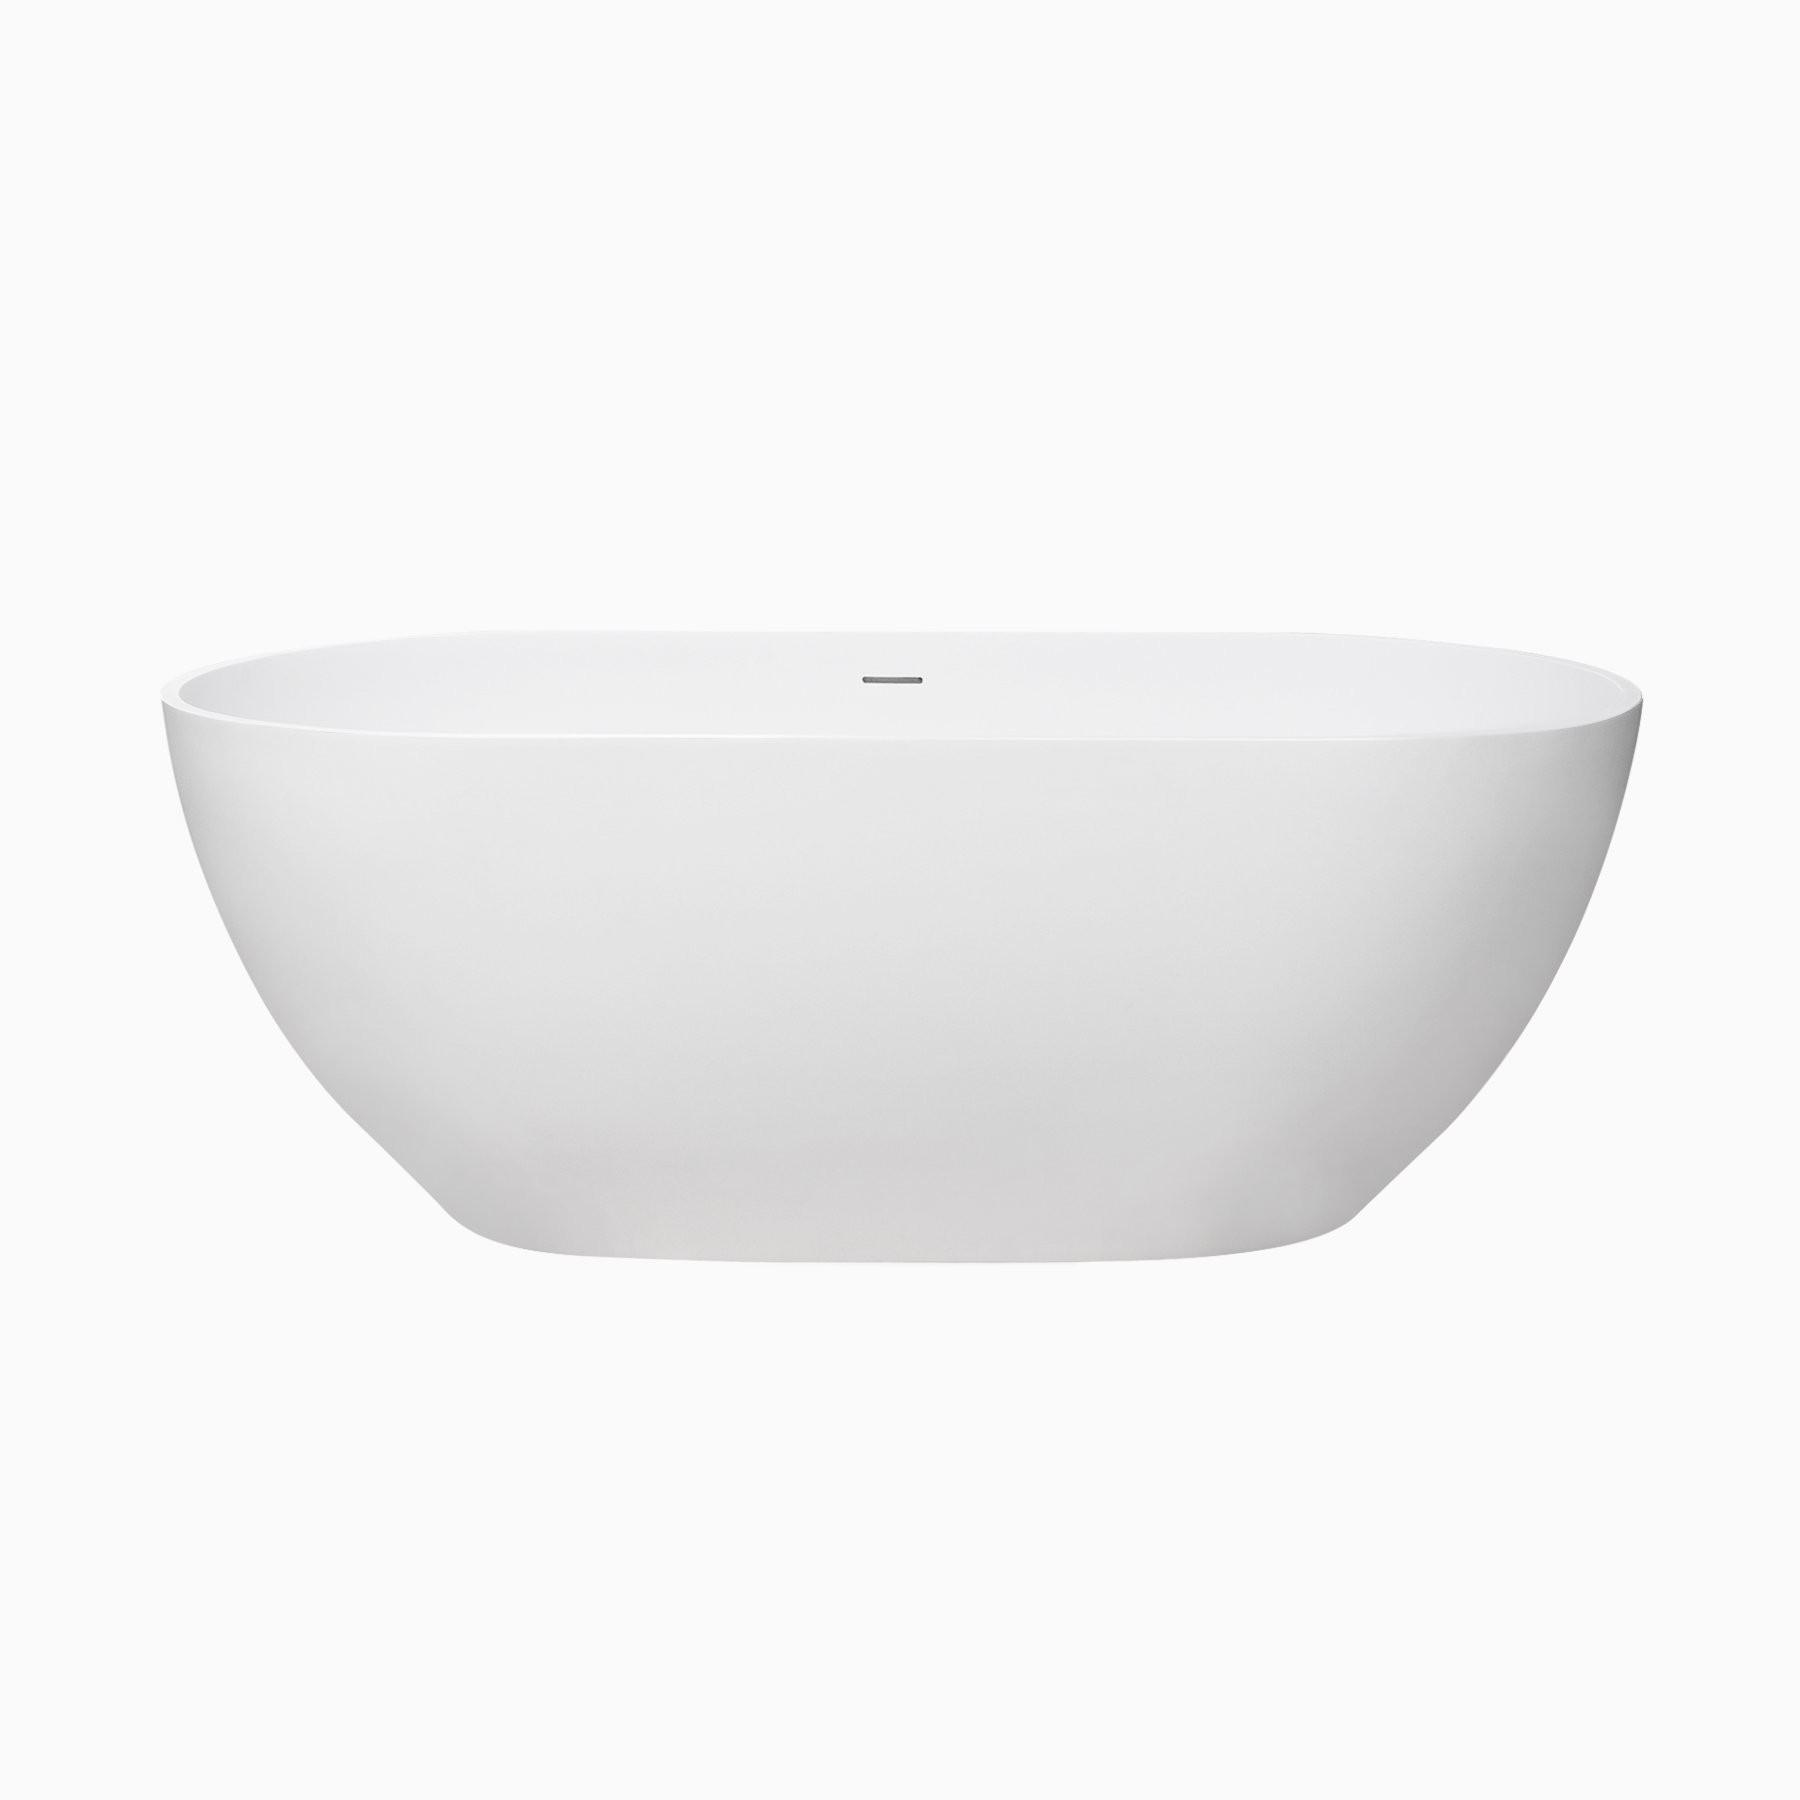 59 Faro Solid Surface Freestanding Bathtub Matte White